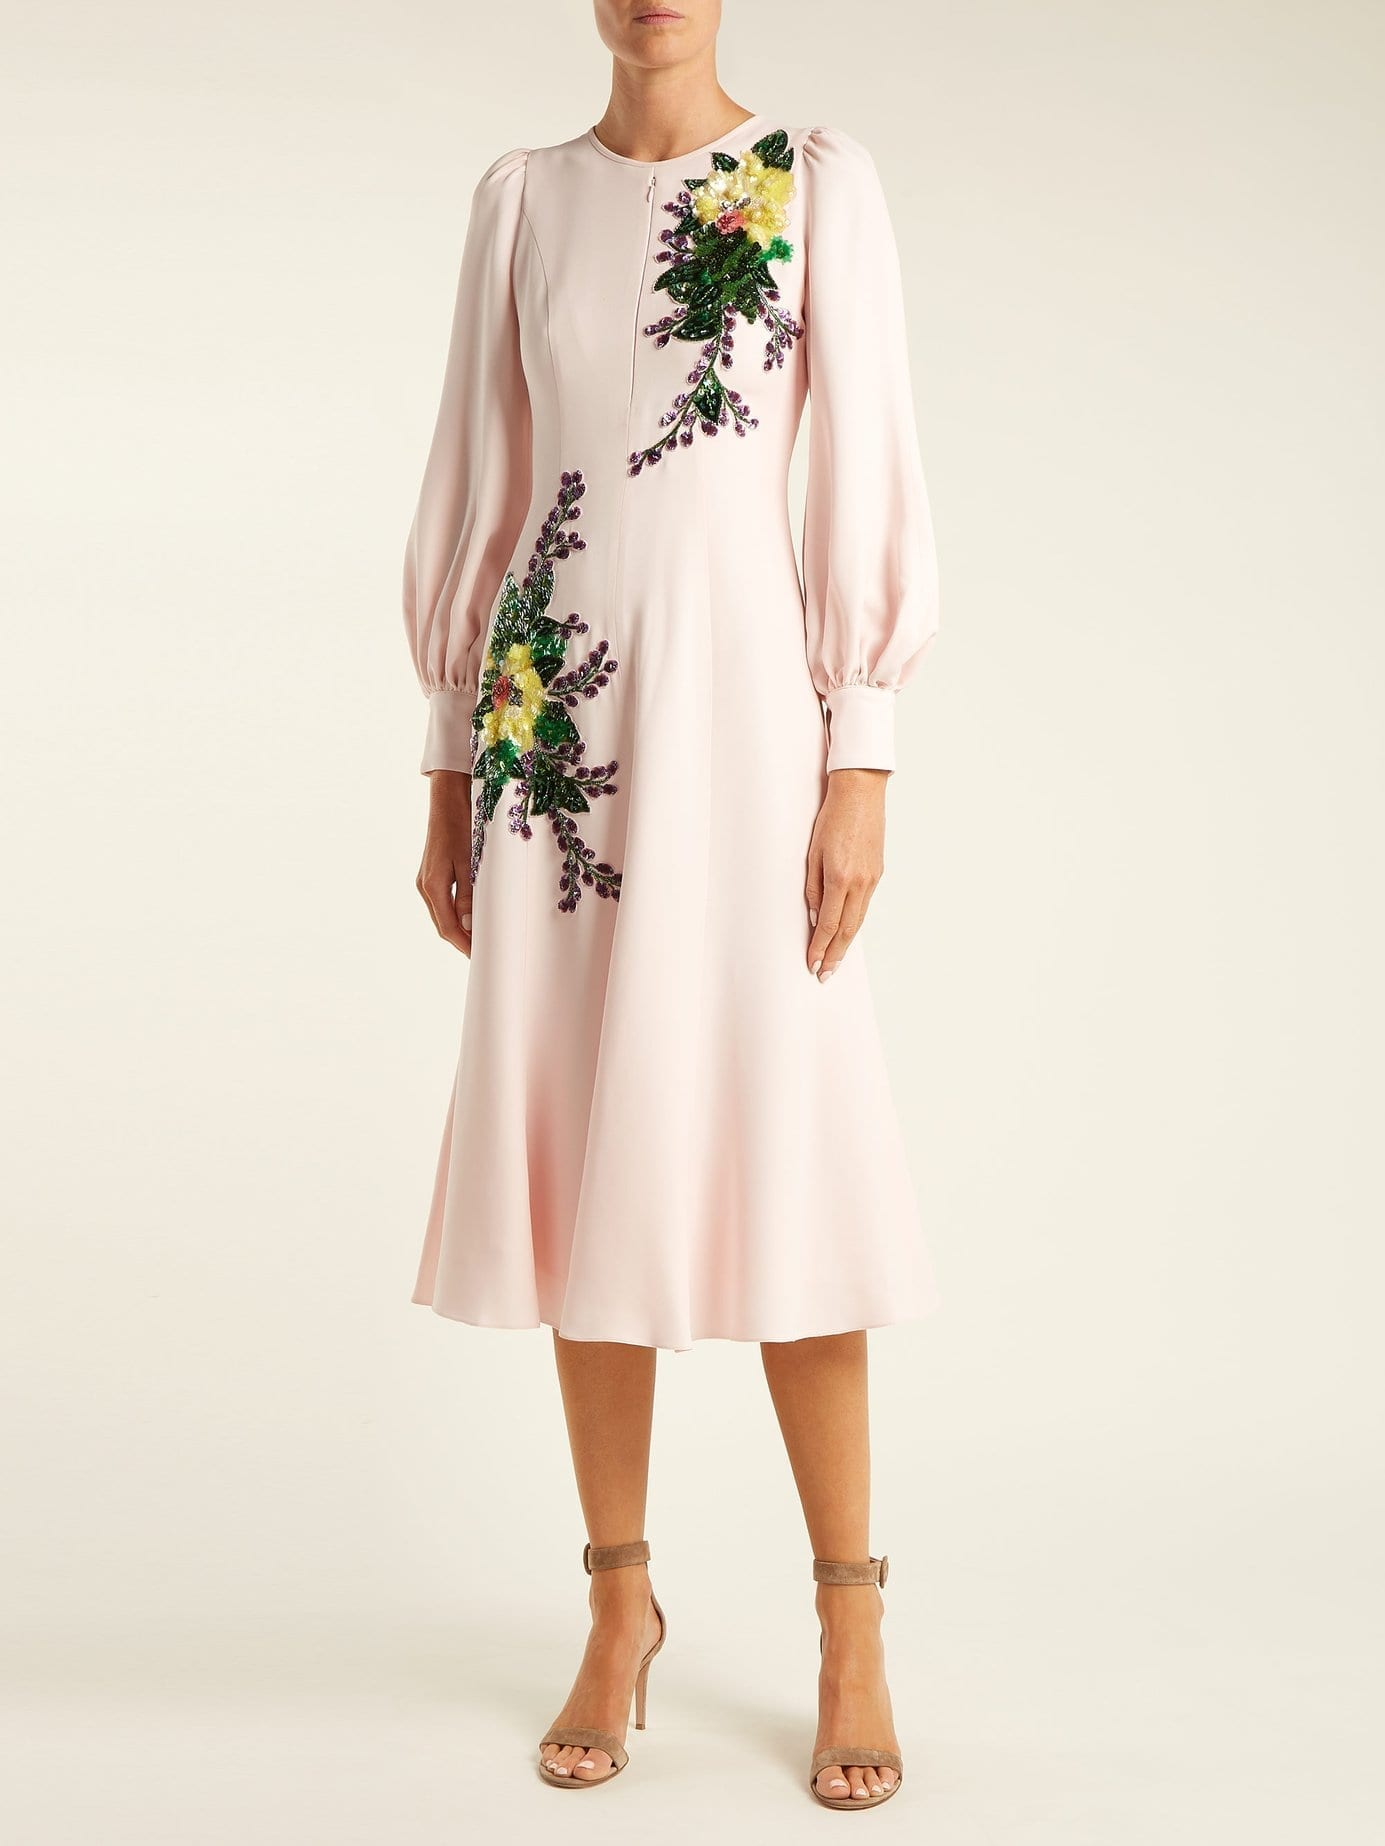 ANDREW GN Sequin Embellished Crepe Midi Pink Dress